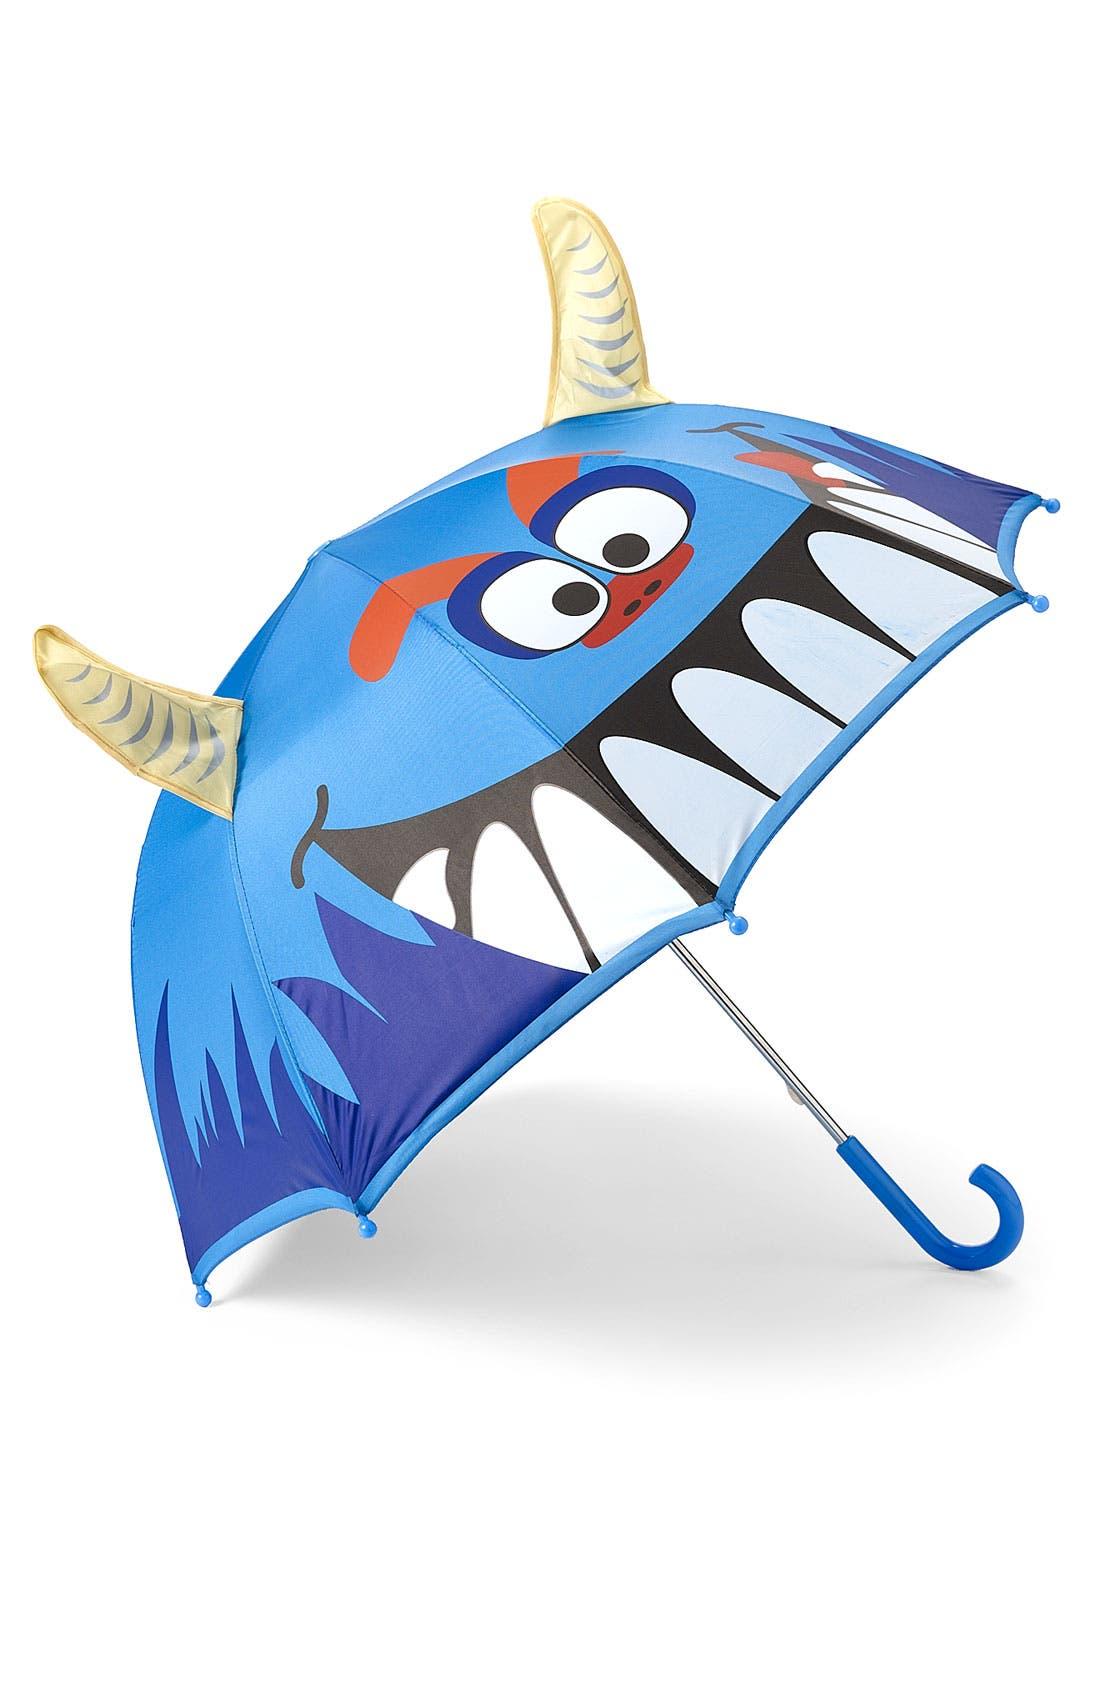 Alternate Image 1 Selected - Western Chief 'Monster' Umbrella